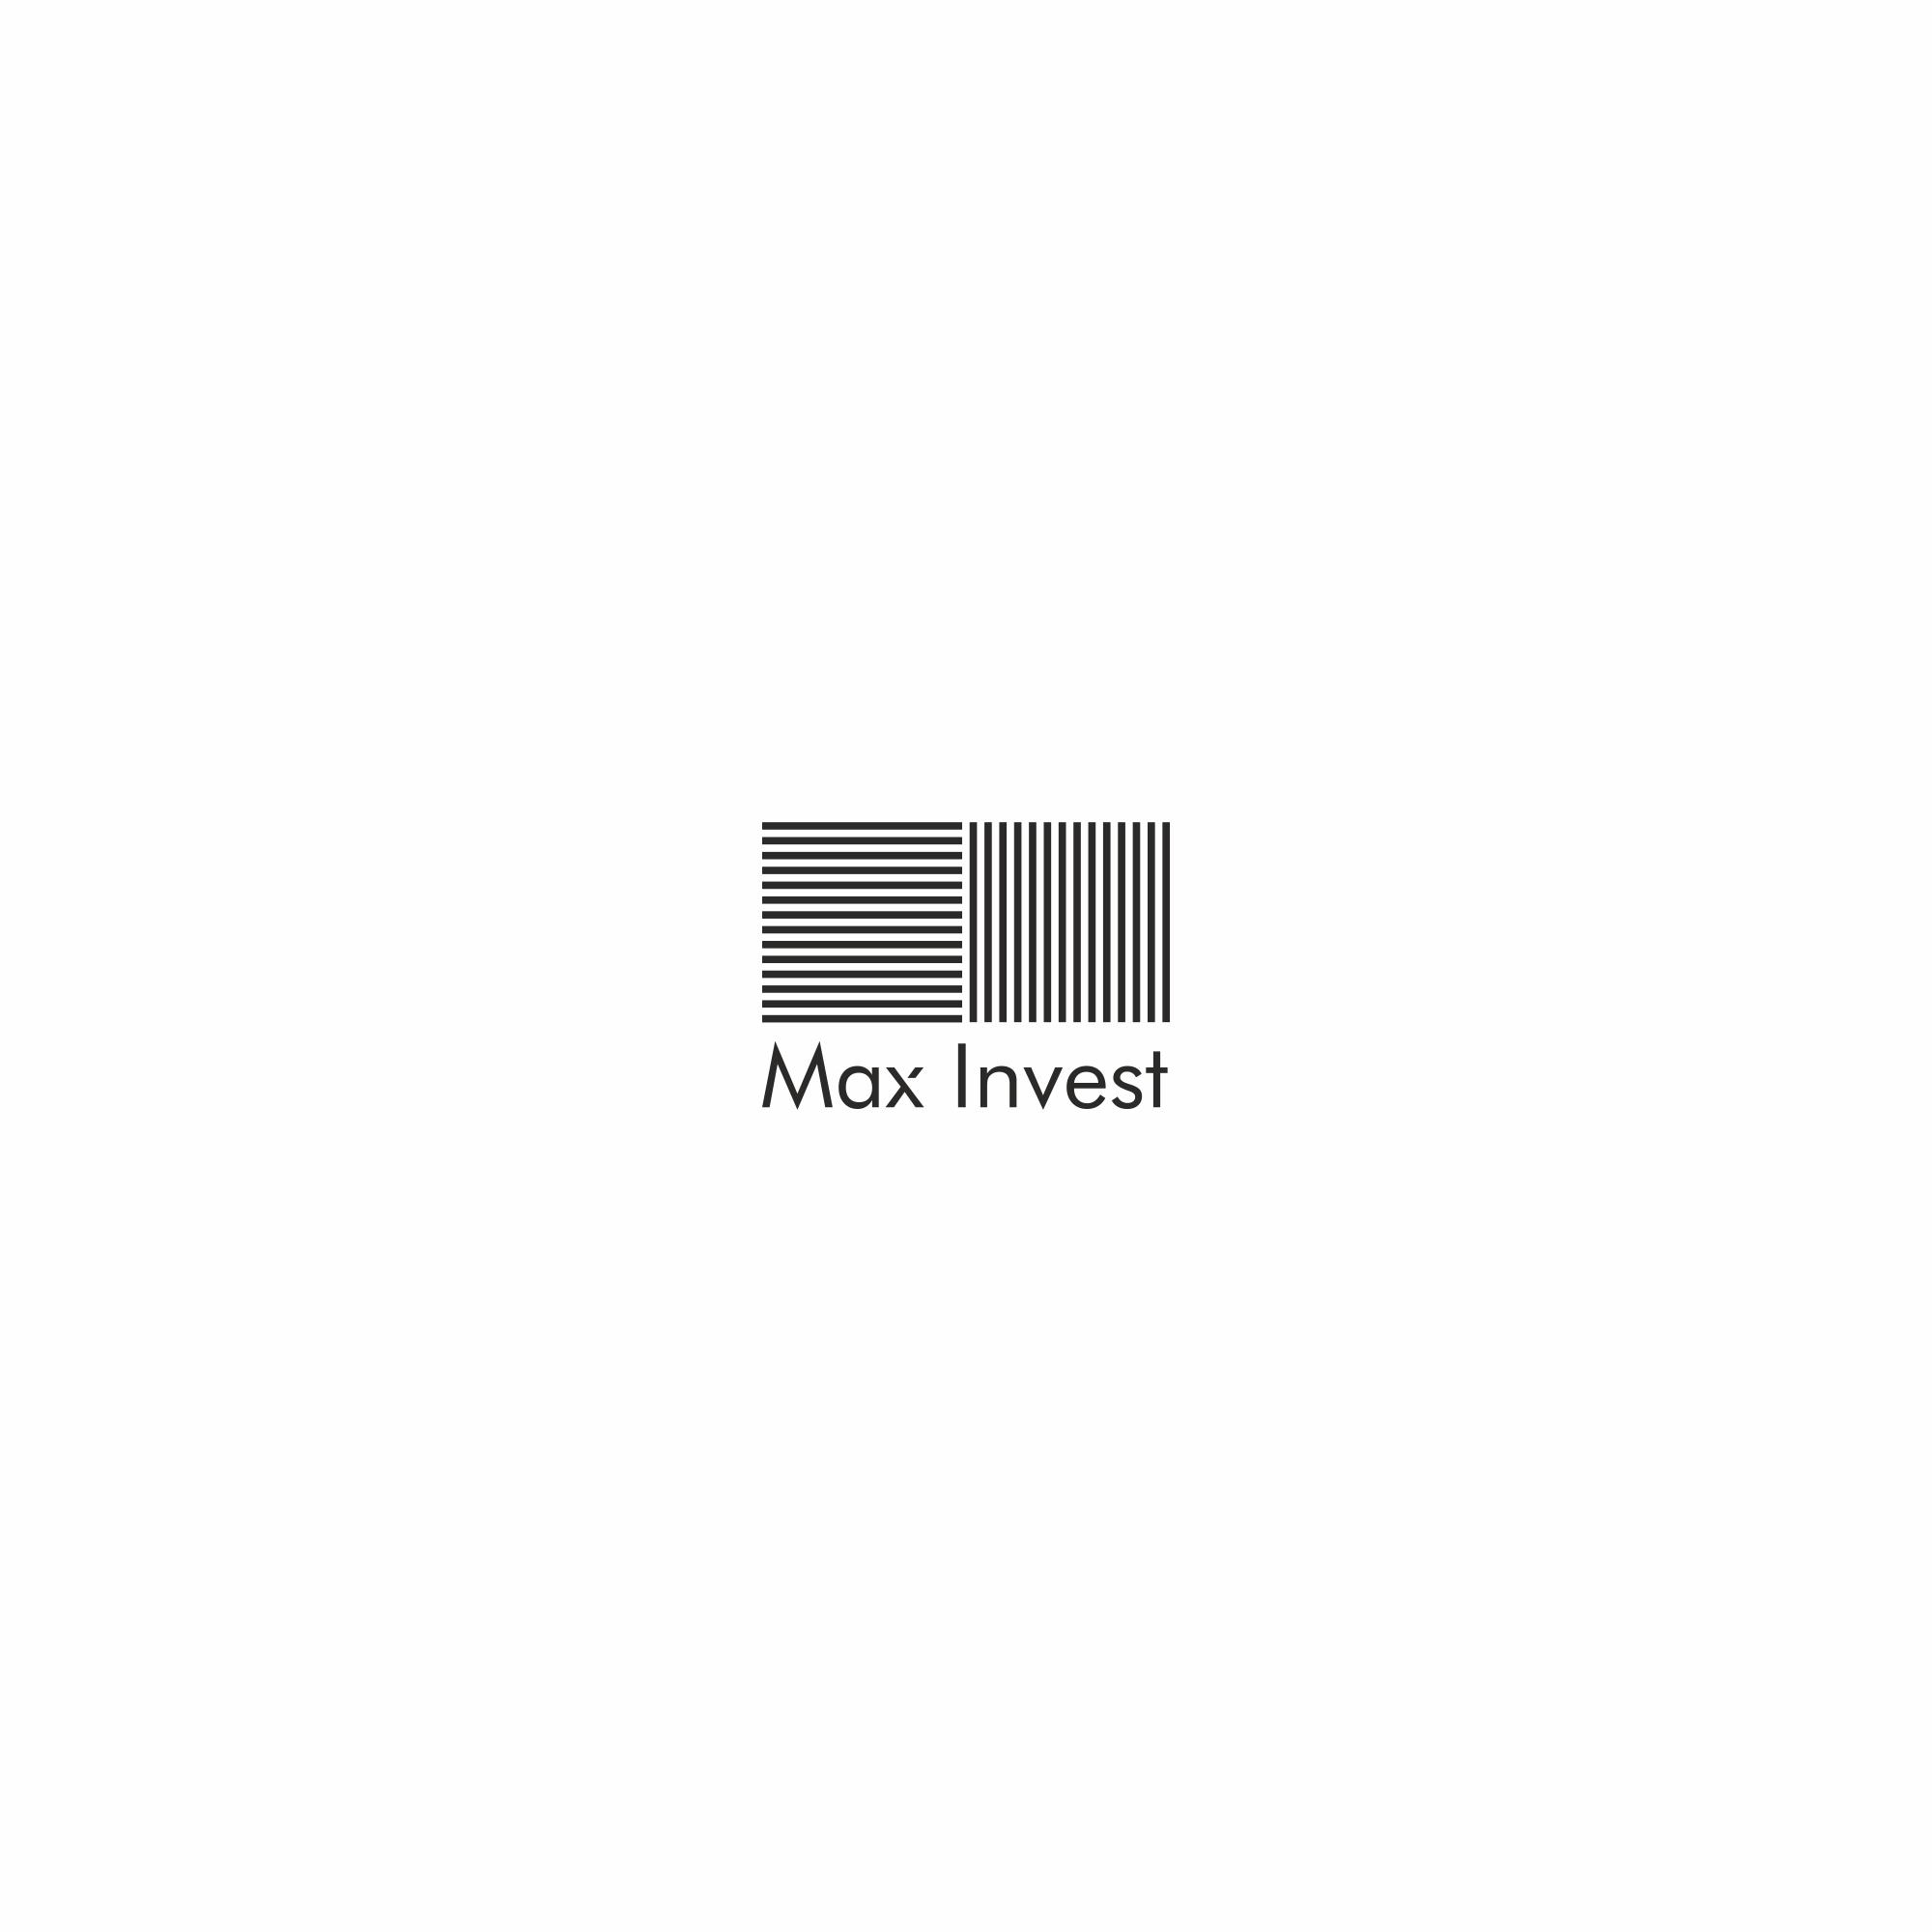 Логотип, фирменный шрифт, фирменный бланк фото f_2745aeaf44eca19a.jpg